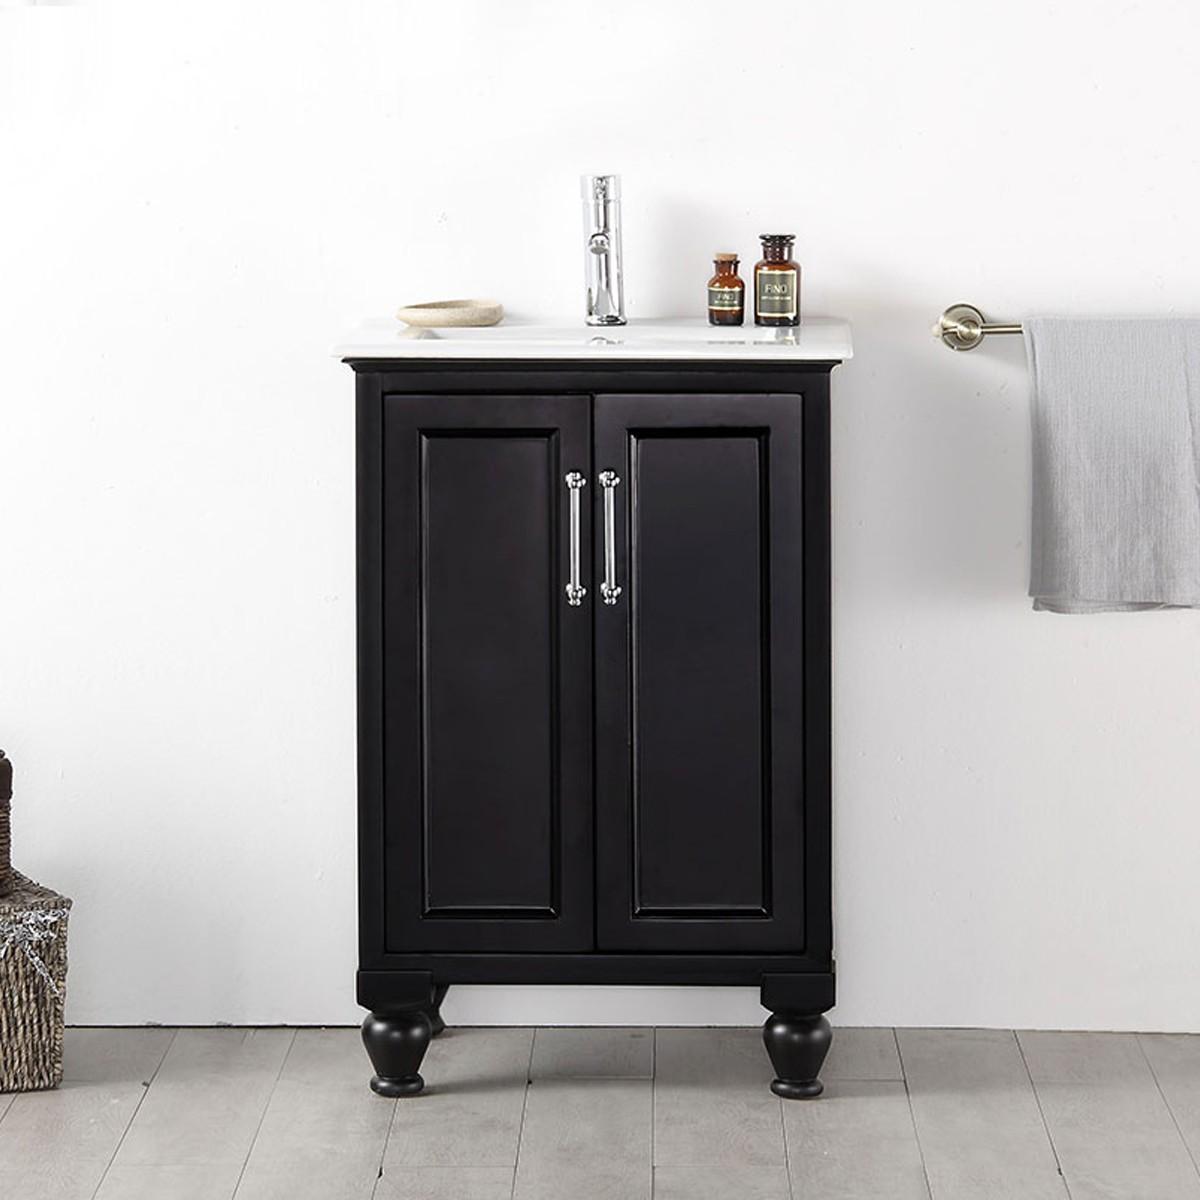 24 In Freestanding Bathroom Vanity Dk 6524 E Decoraport Canada